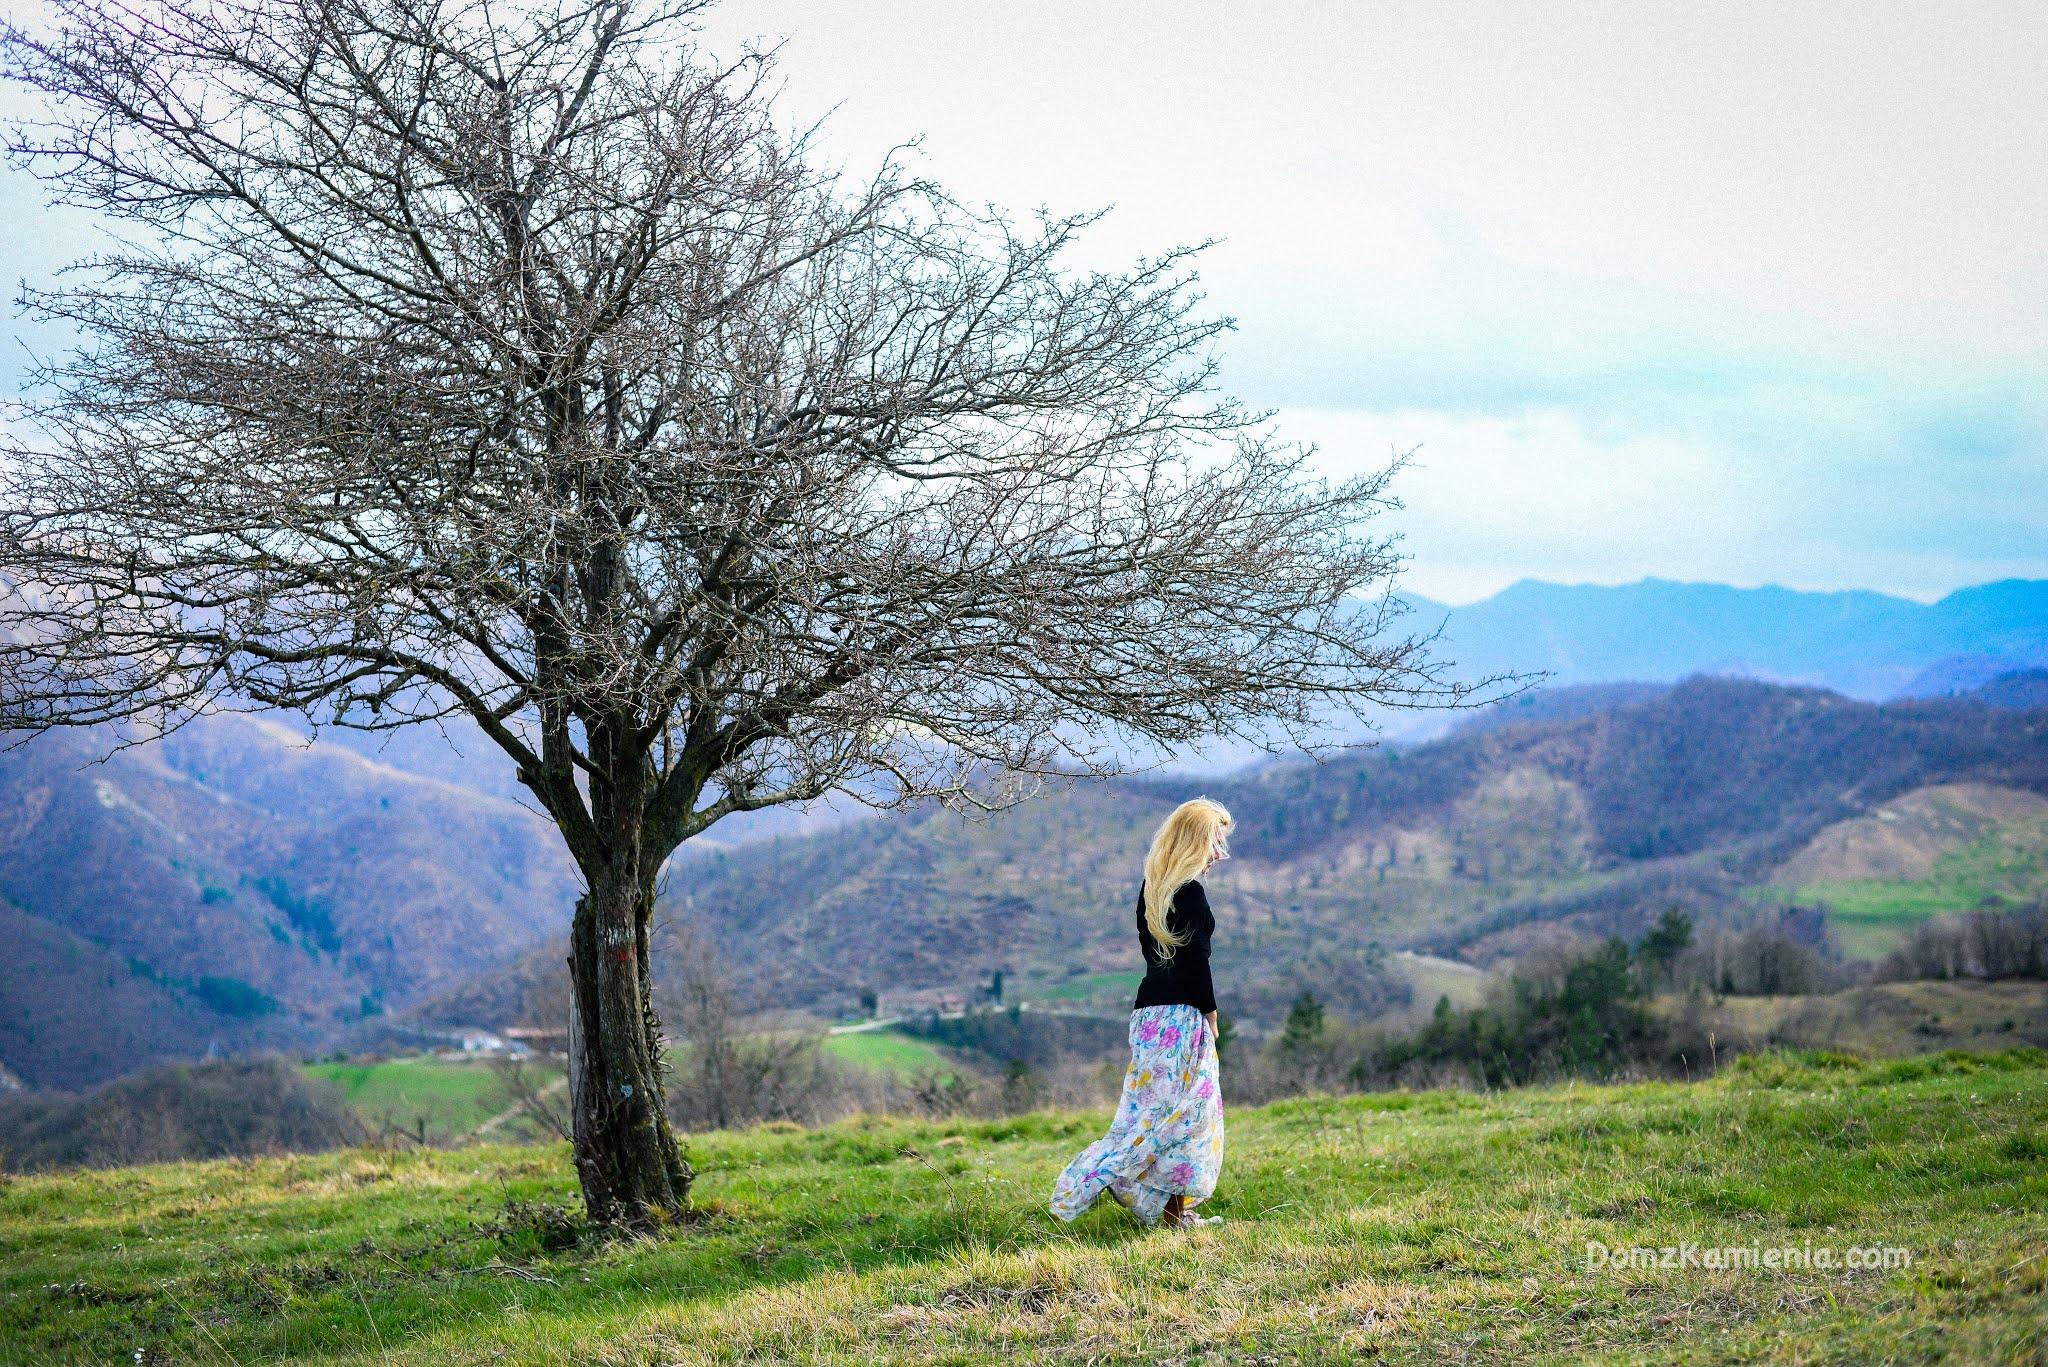 Kasia z Domu z Kamienia - blog, Marradi